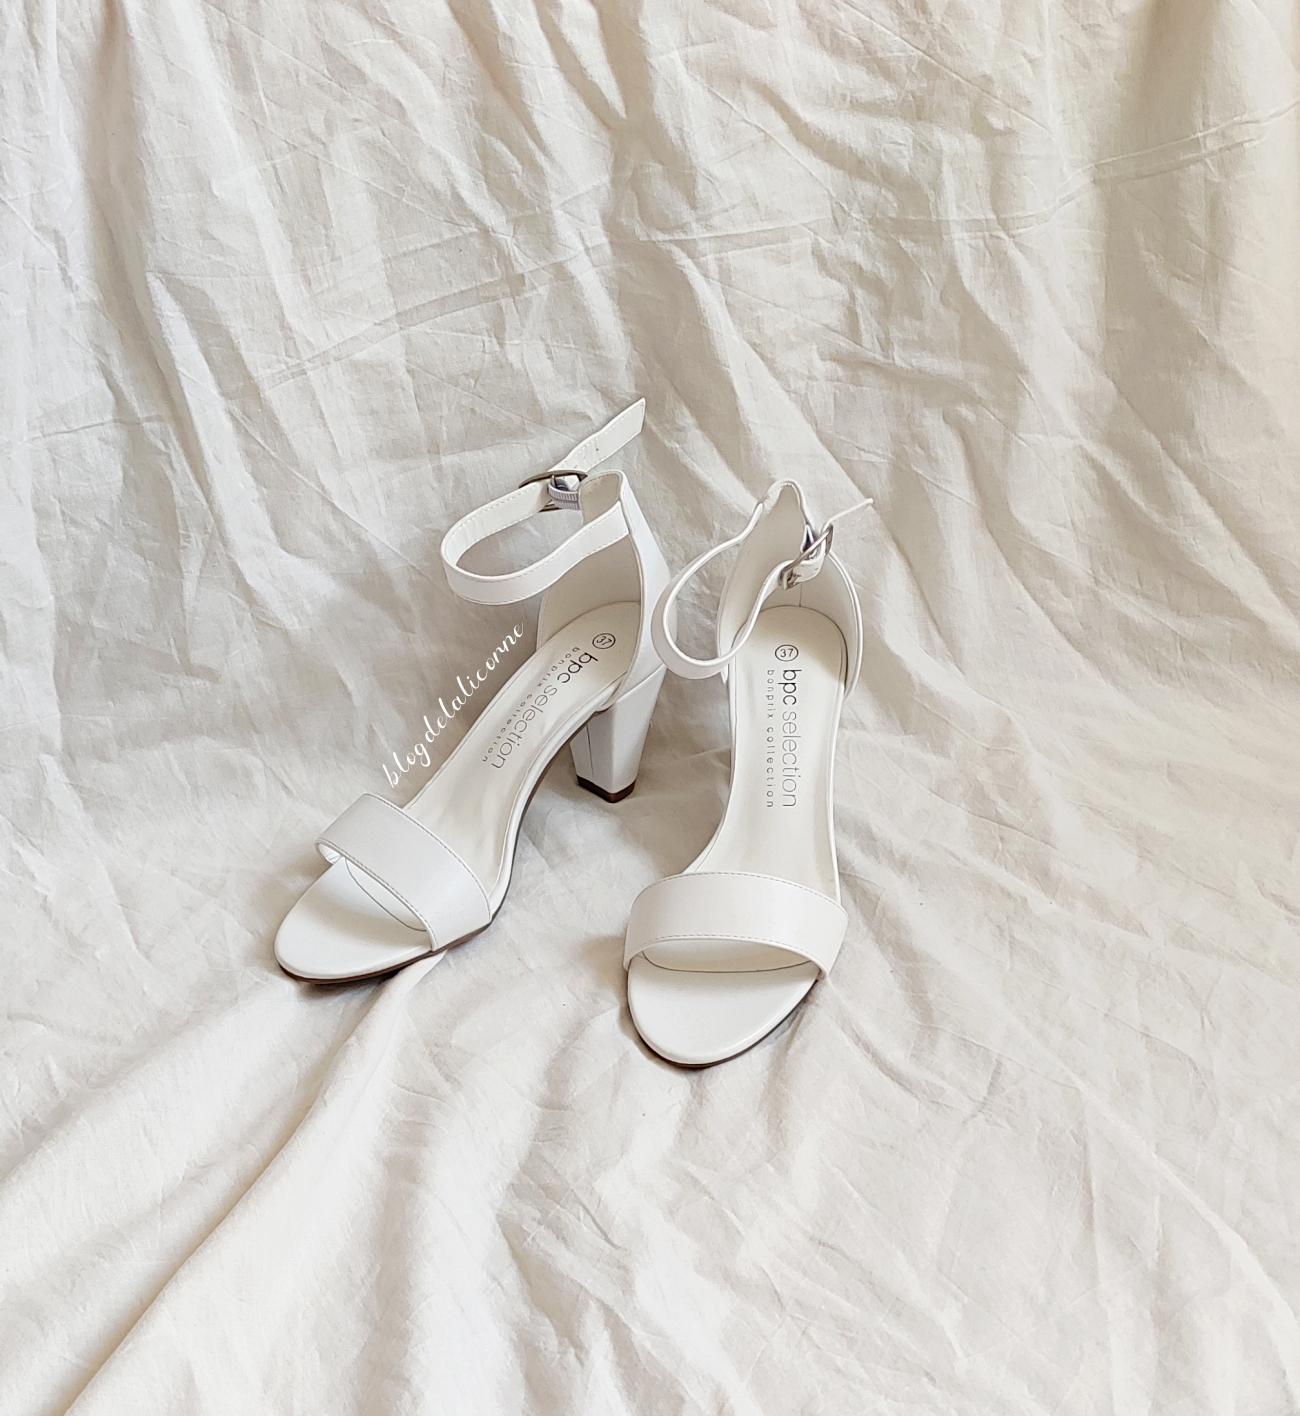 Bonprix biele sandále na nízkom podpätku recenzia